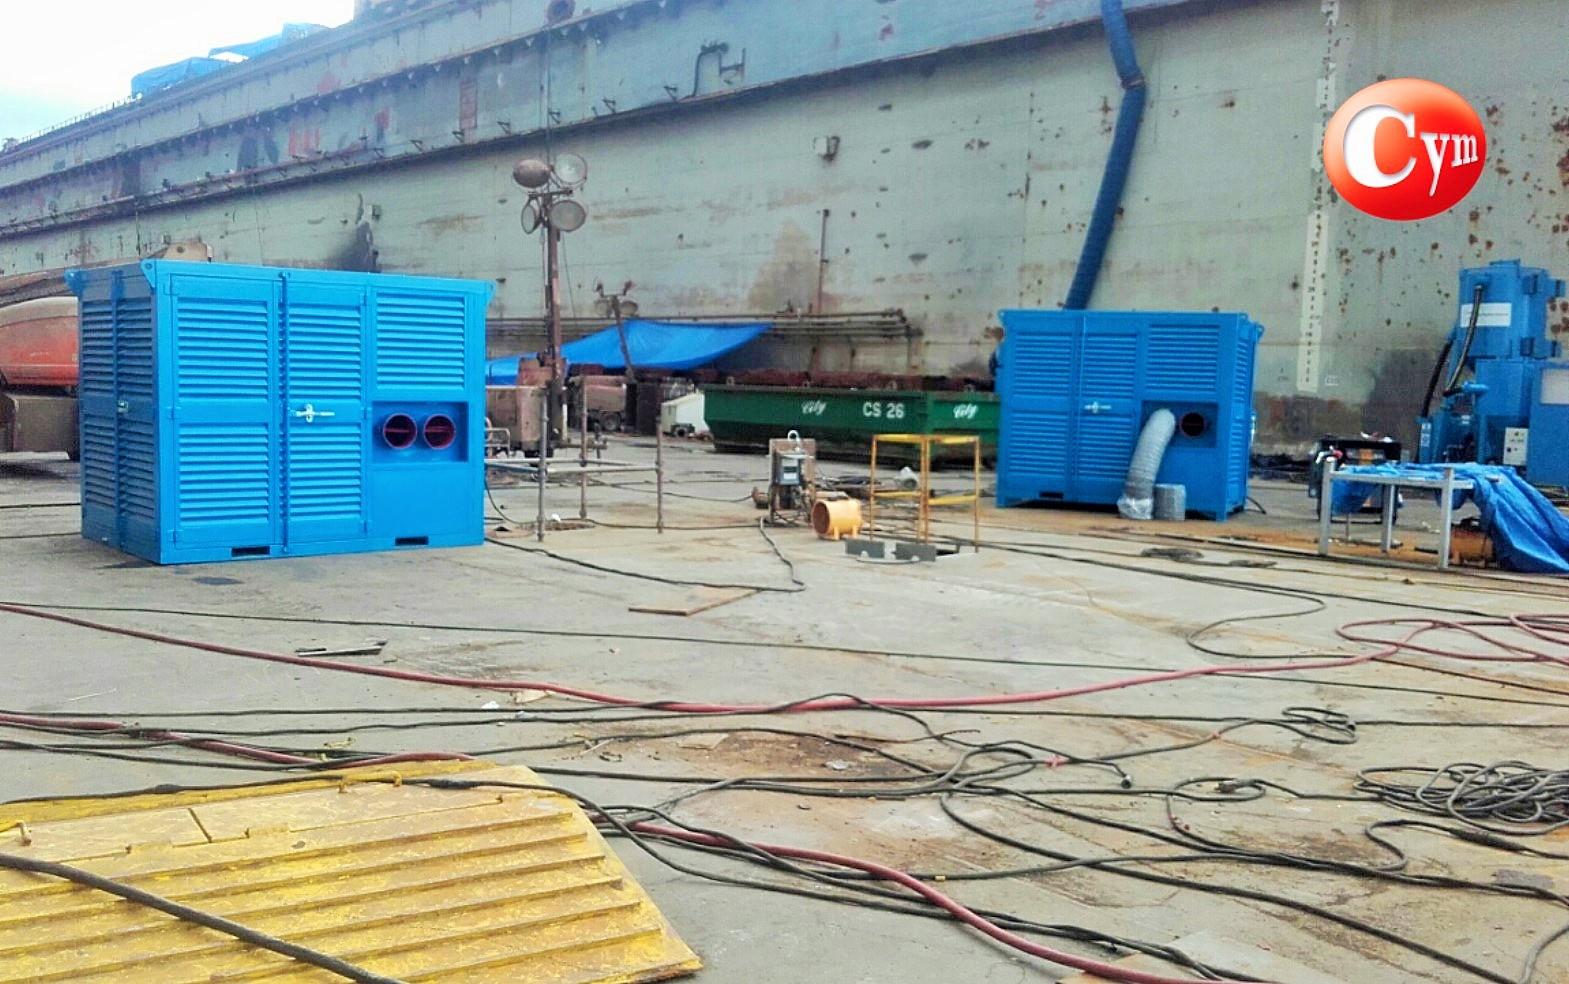 Deshumidificador-para-granallado-o-pintura-de-barcos-cym